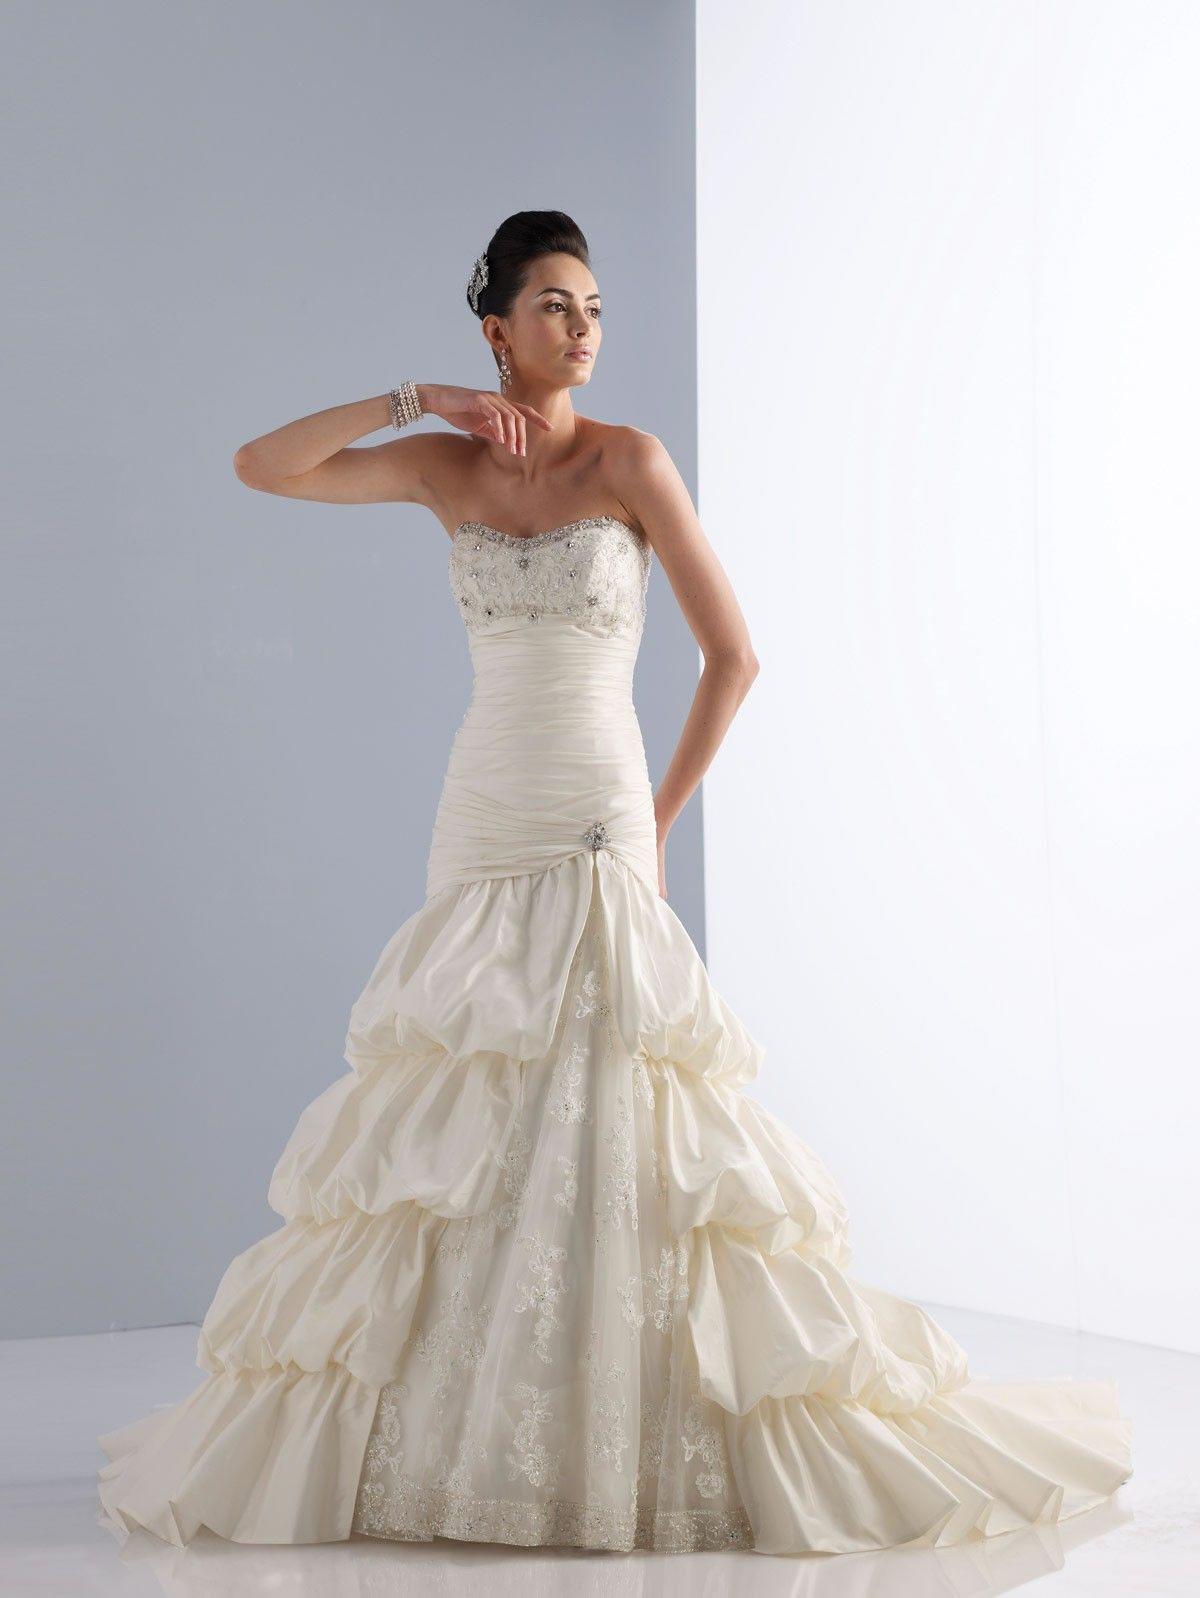 Blush mermaid wedding dress  Taffeta Softly Curved Neckline Asymmetrically Dropped Bodice Aline